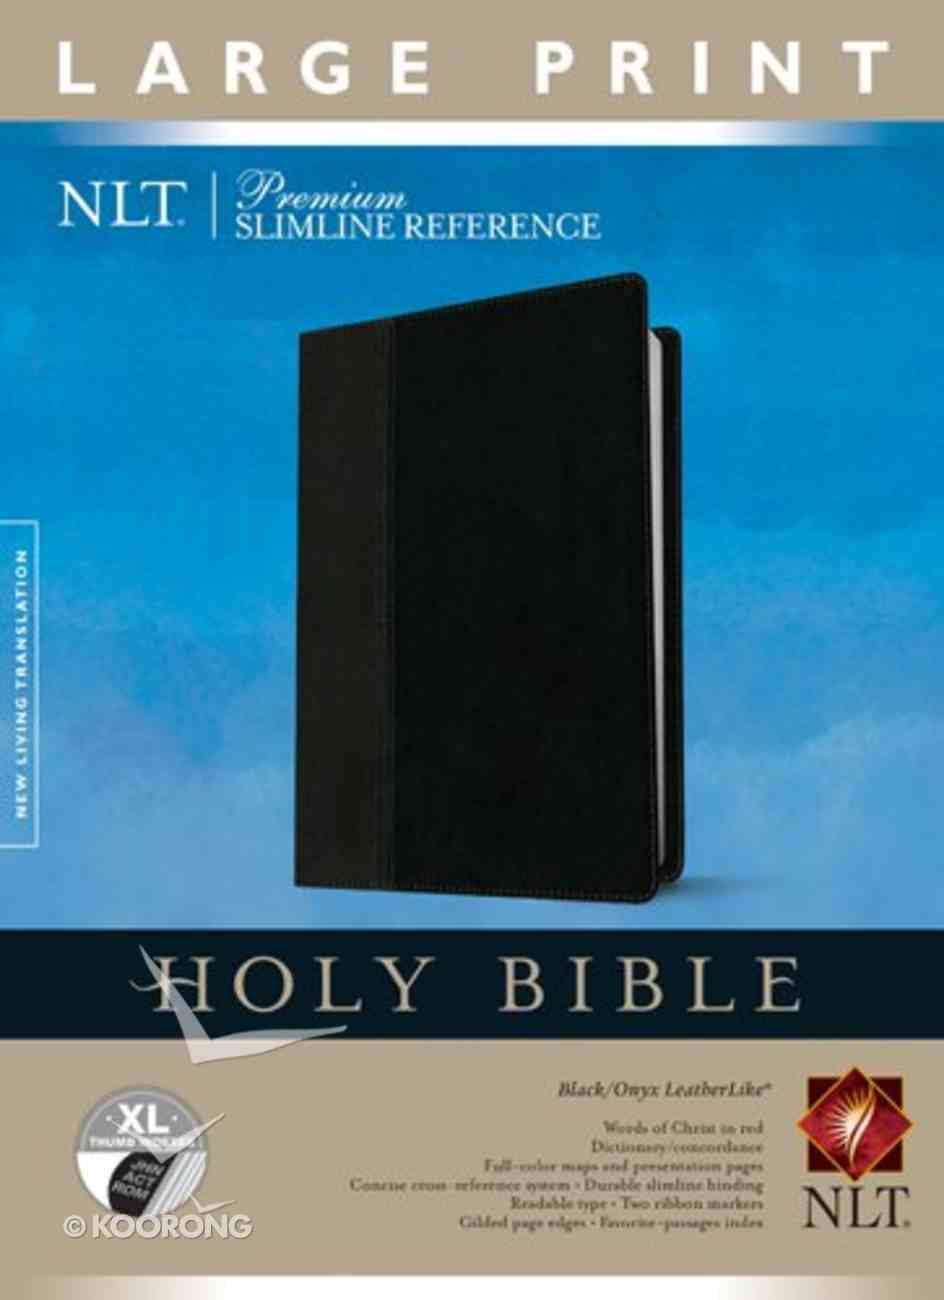 NLT Premium Slimline Reference Indexed Large Print Black/Onyx (Red Letter Edition) Imitation Leather